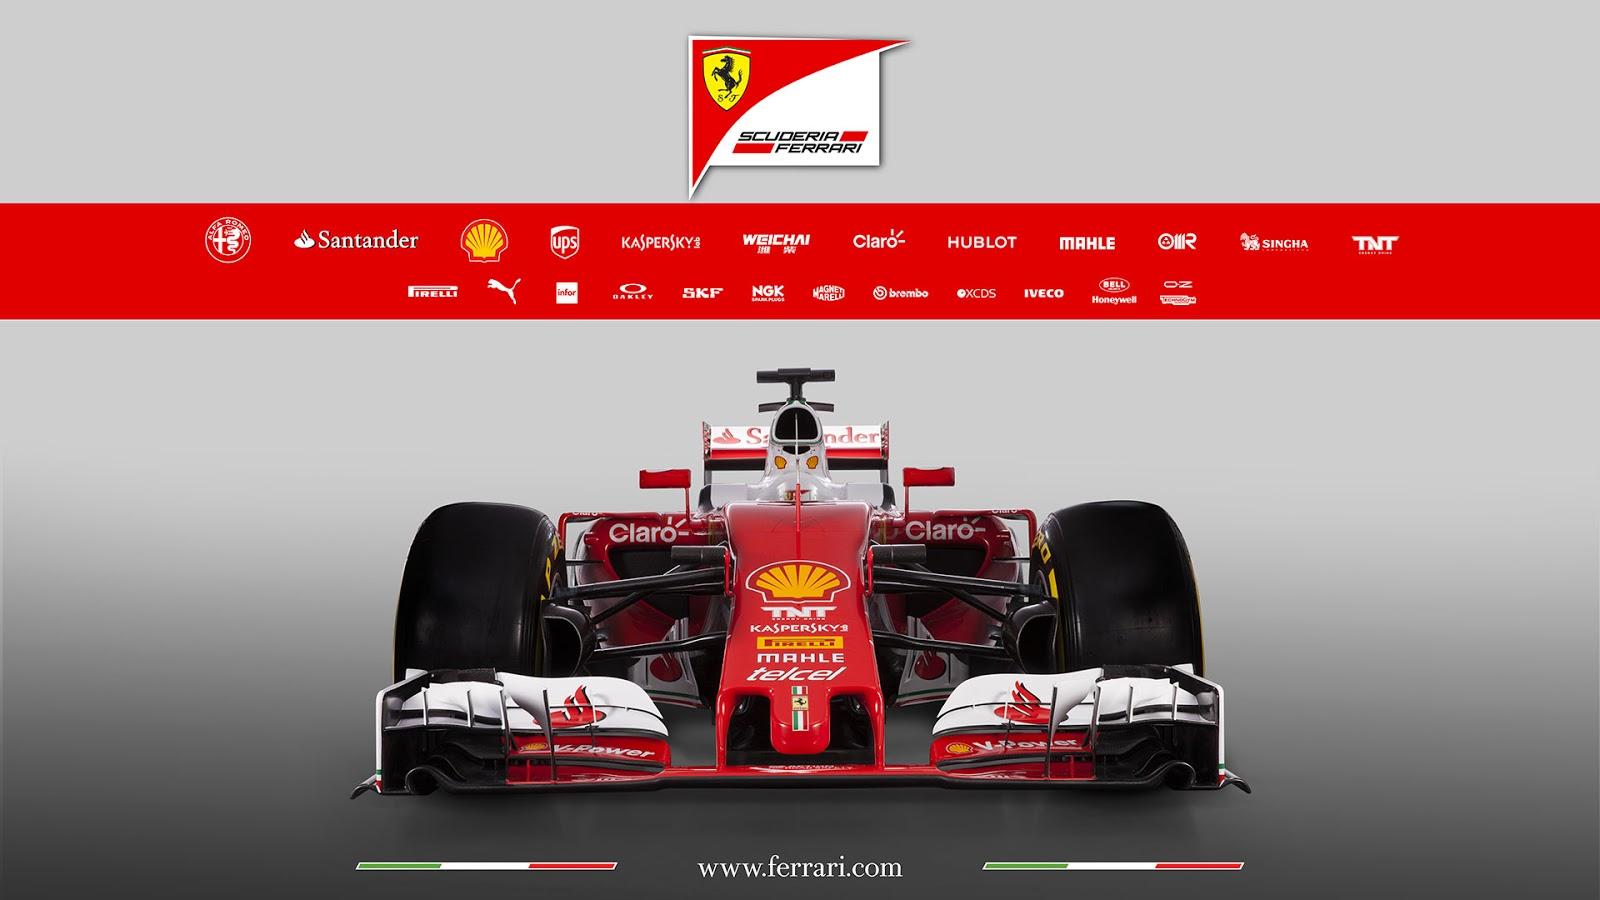 Ferrari Sf16 H 2016 F1 Wallpaper Kfzoom